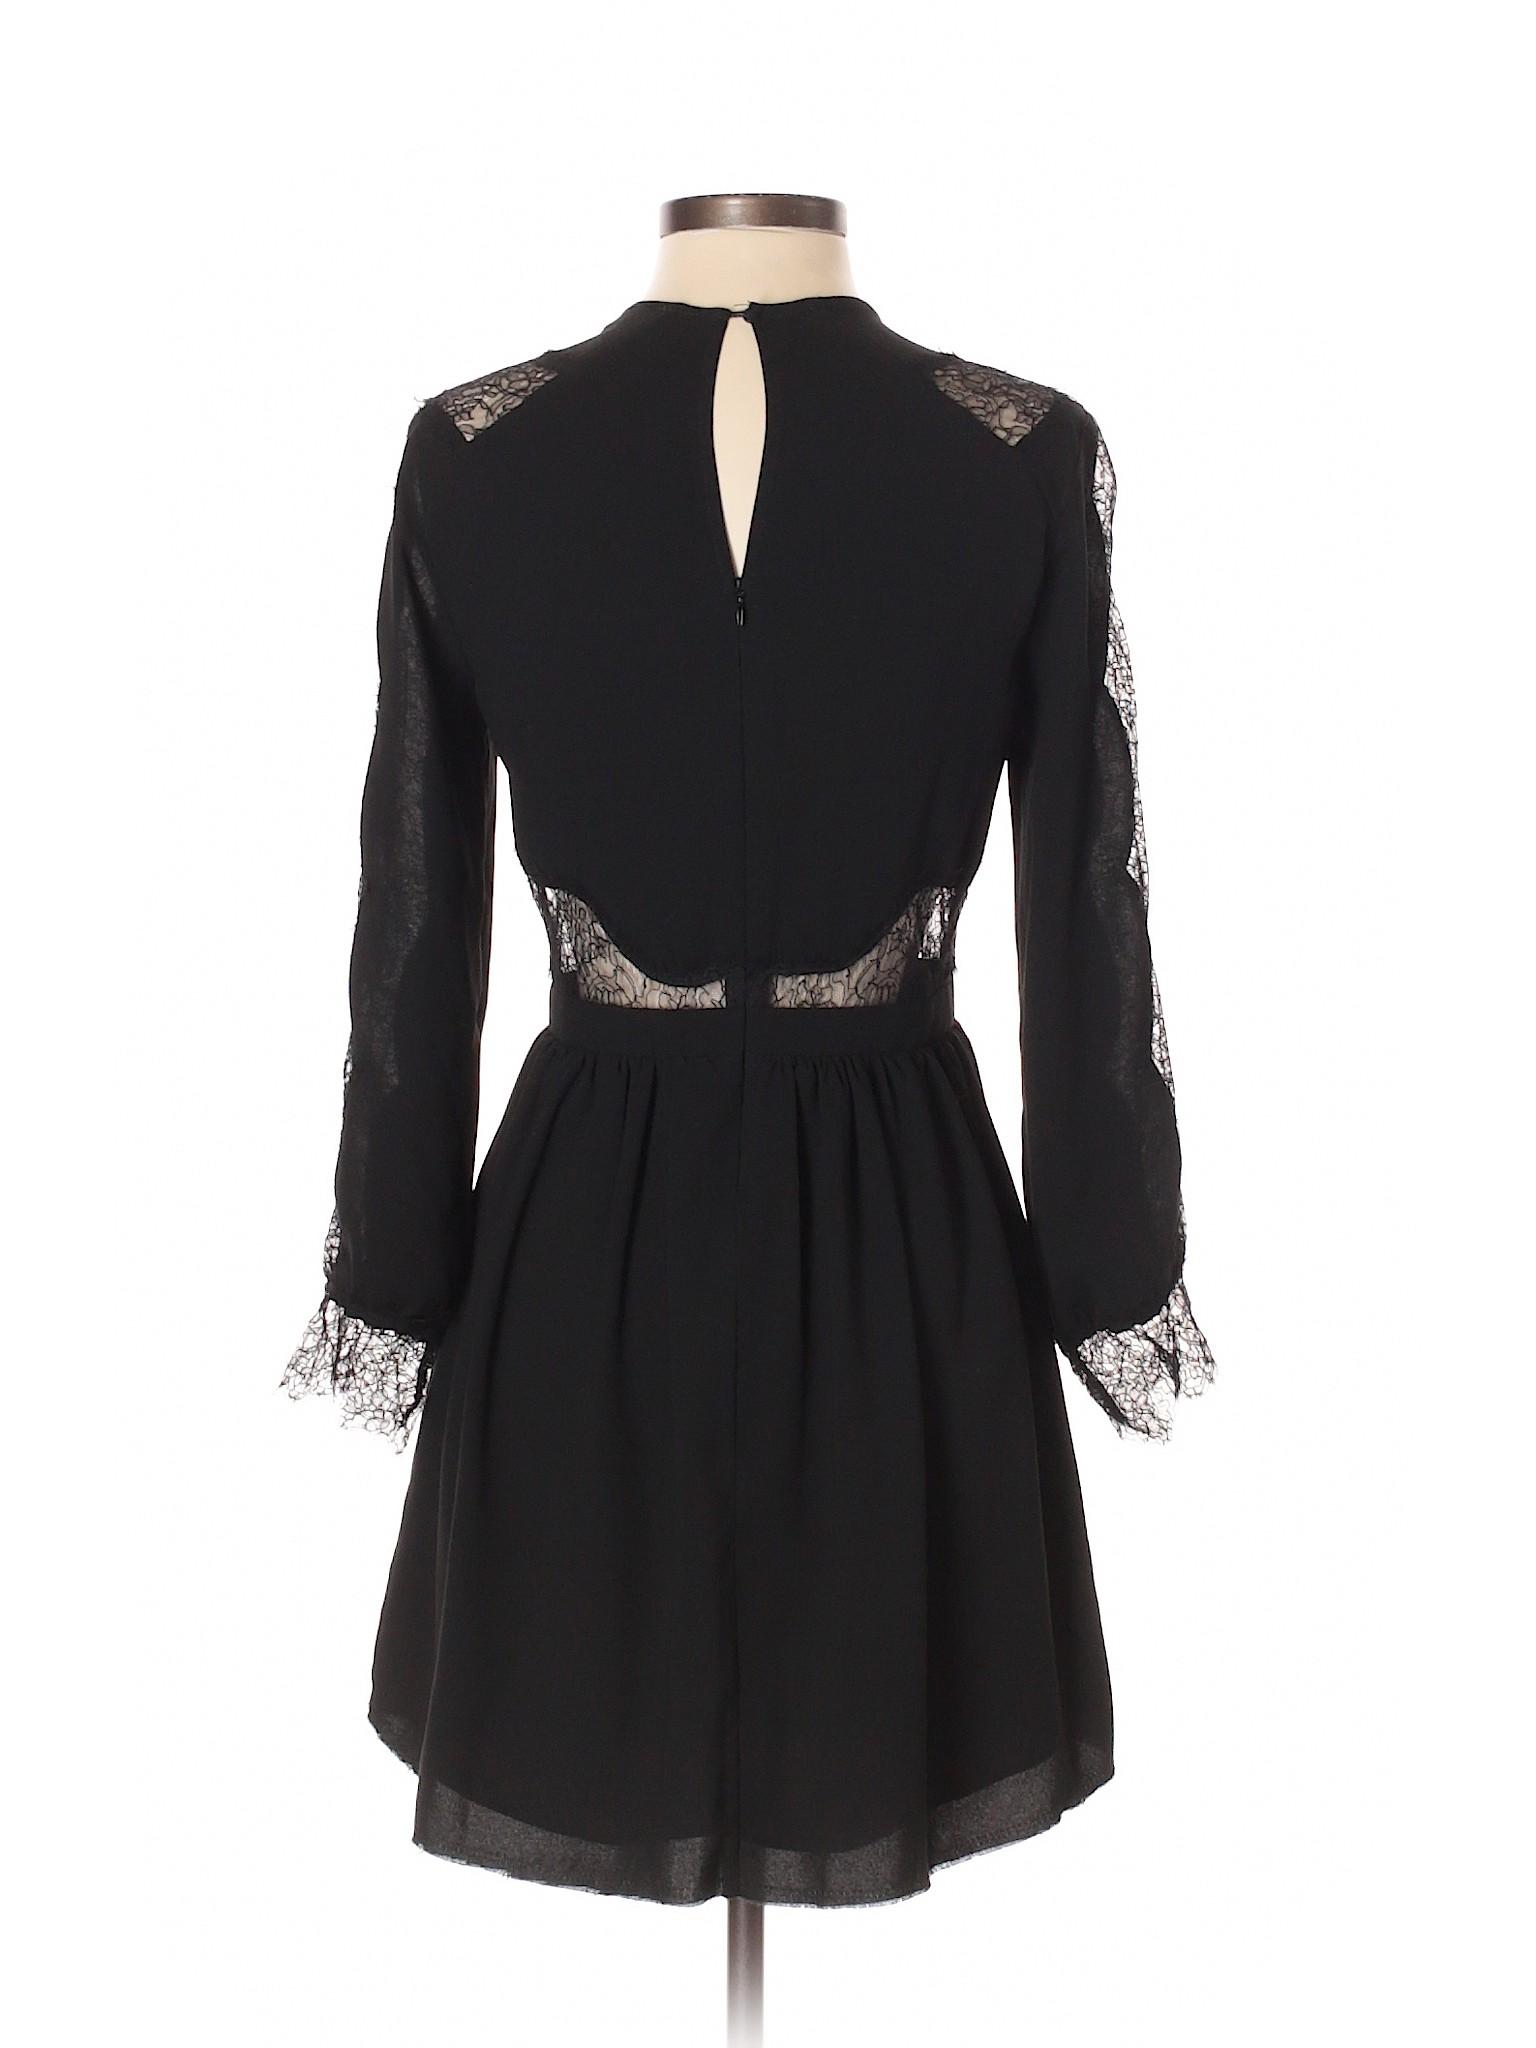 Selling Casual Selling Dress IRO IRO wqWTHS5T